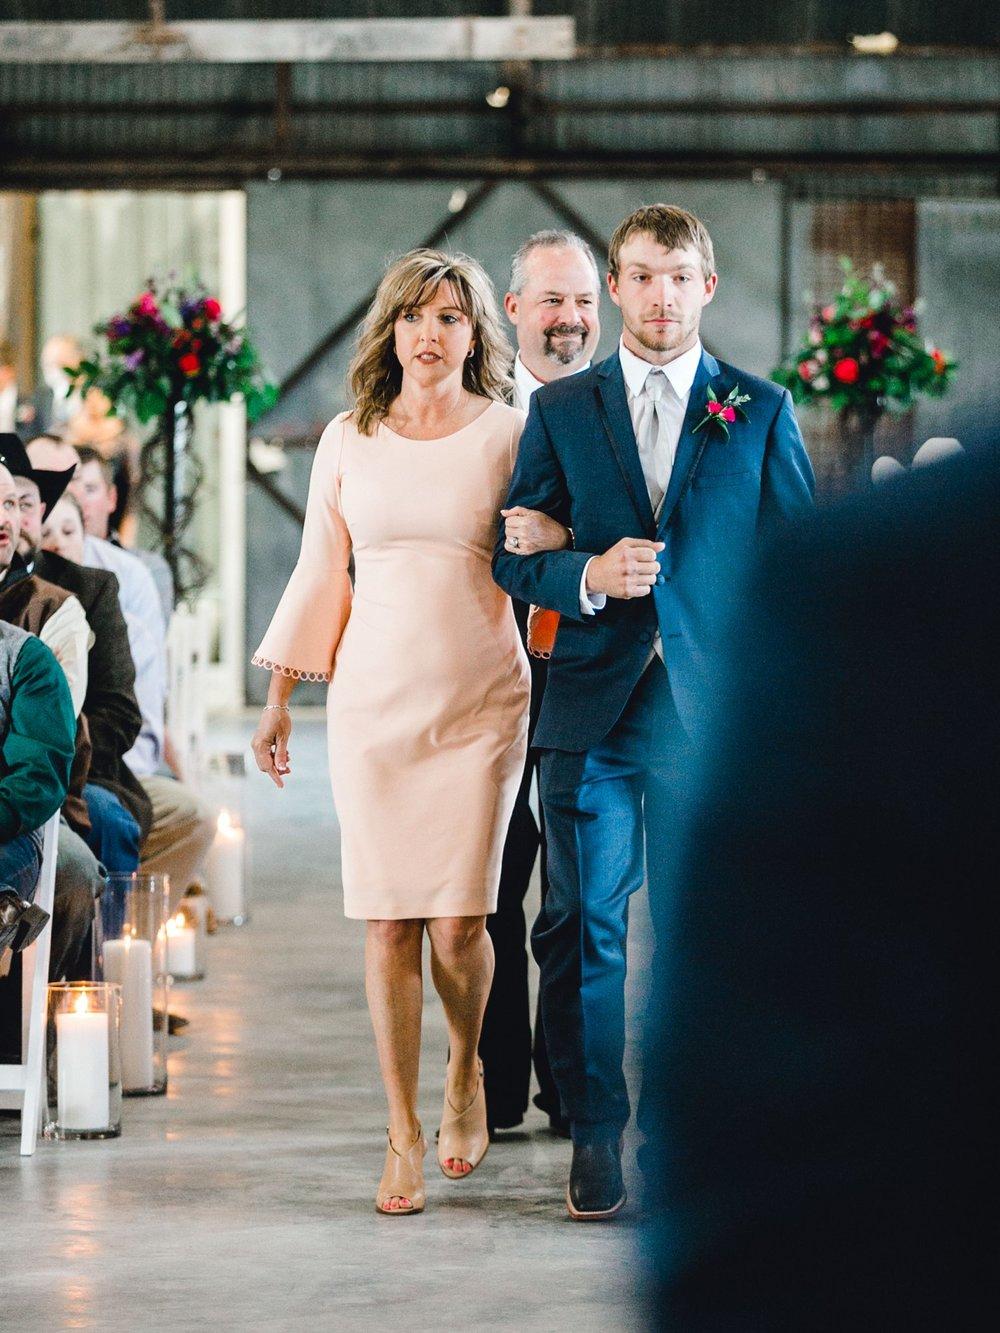 Jenna-and-garrett-Everett-kitalou-gin-lubbock-wedding-dayspring-designs-lubbock-wedding-photographer_0083.jpg